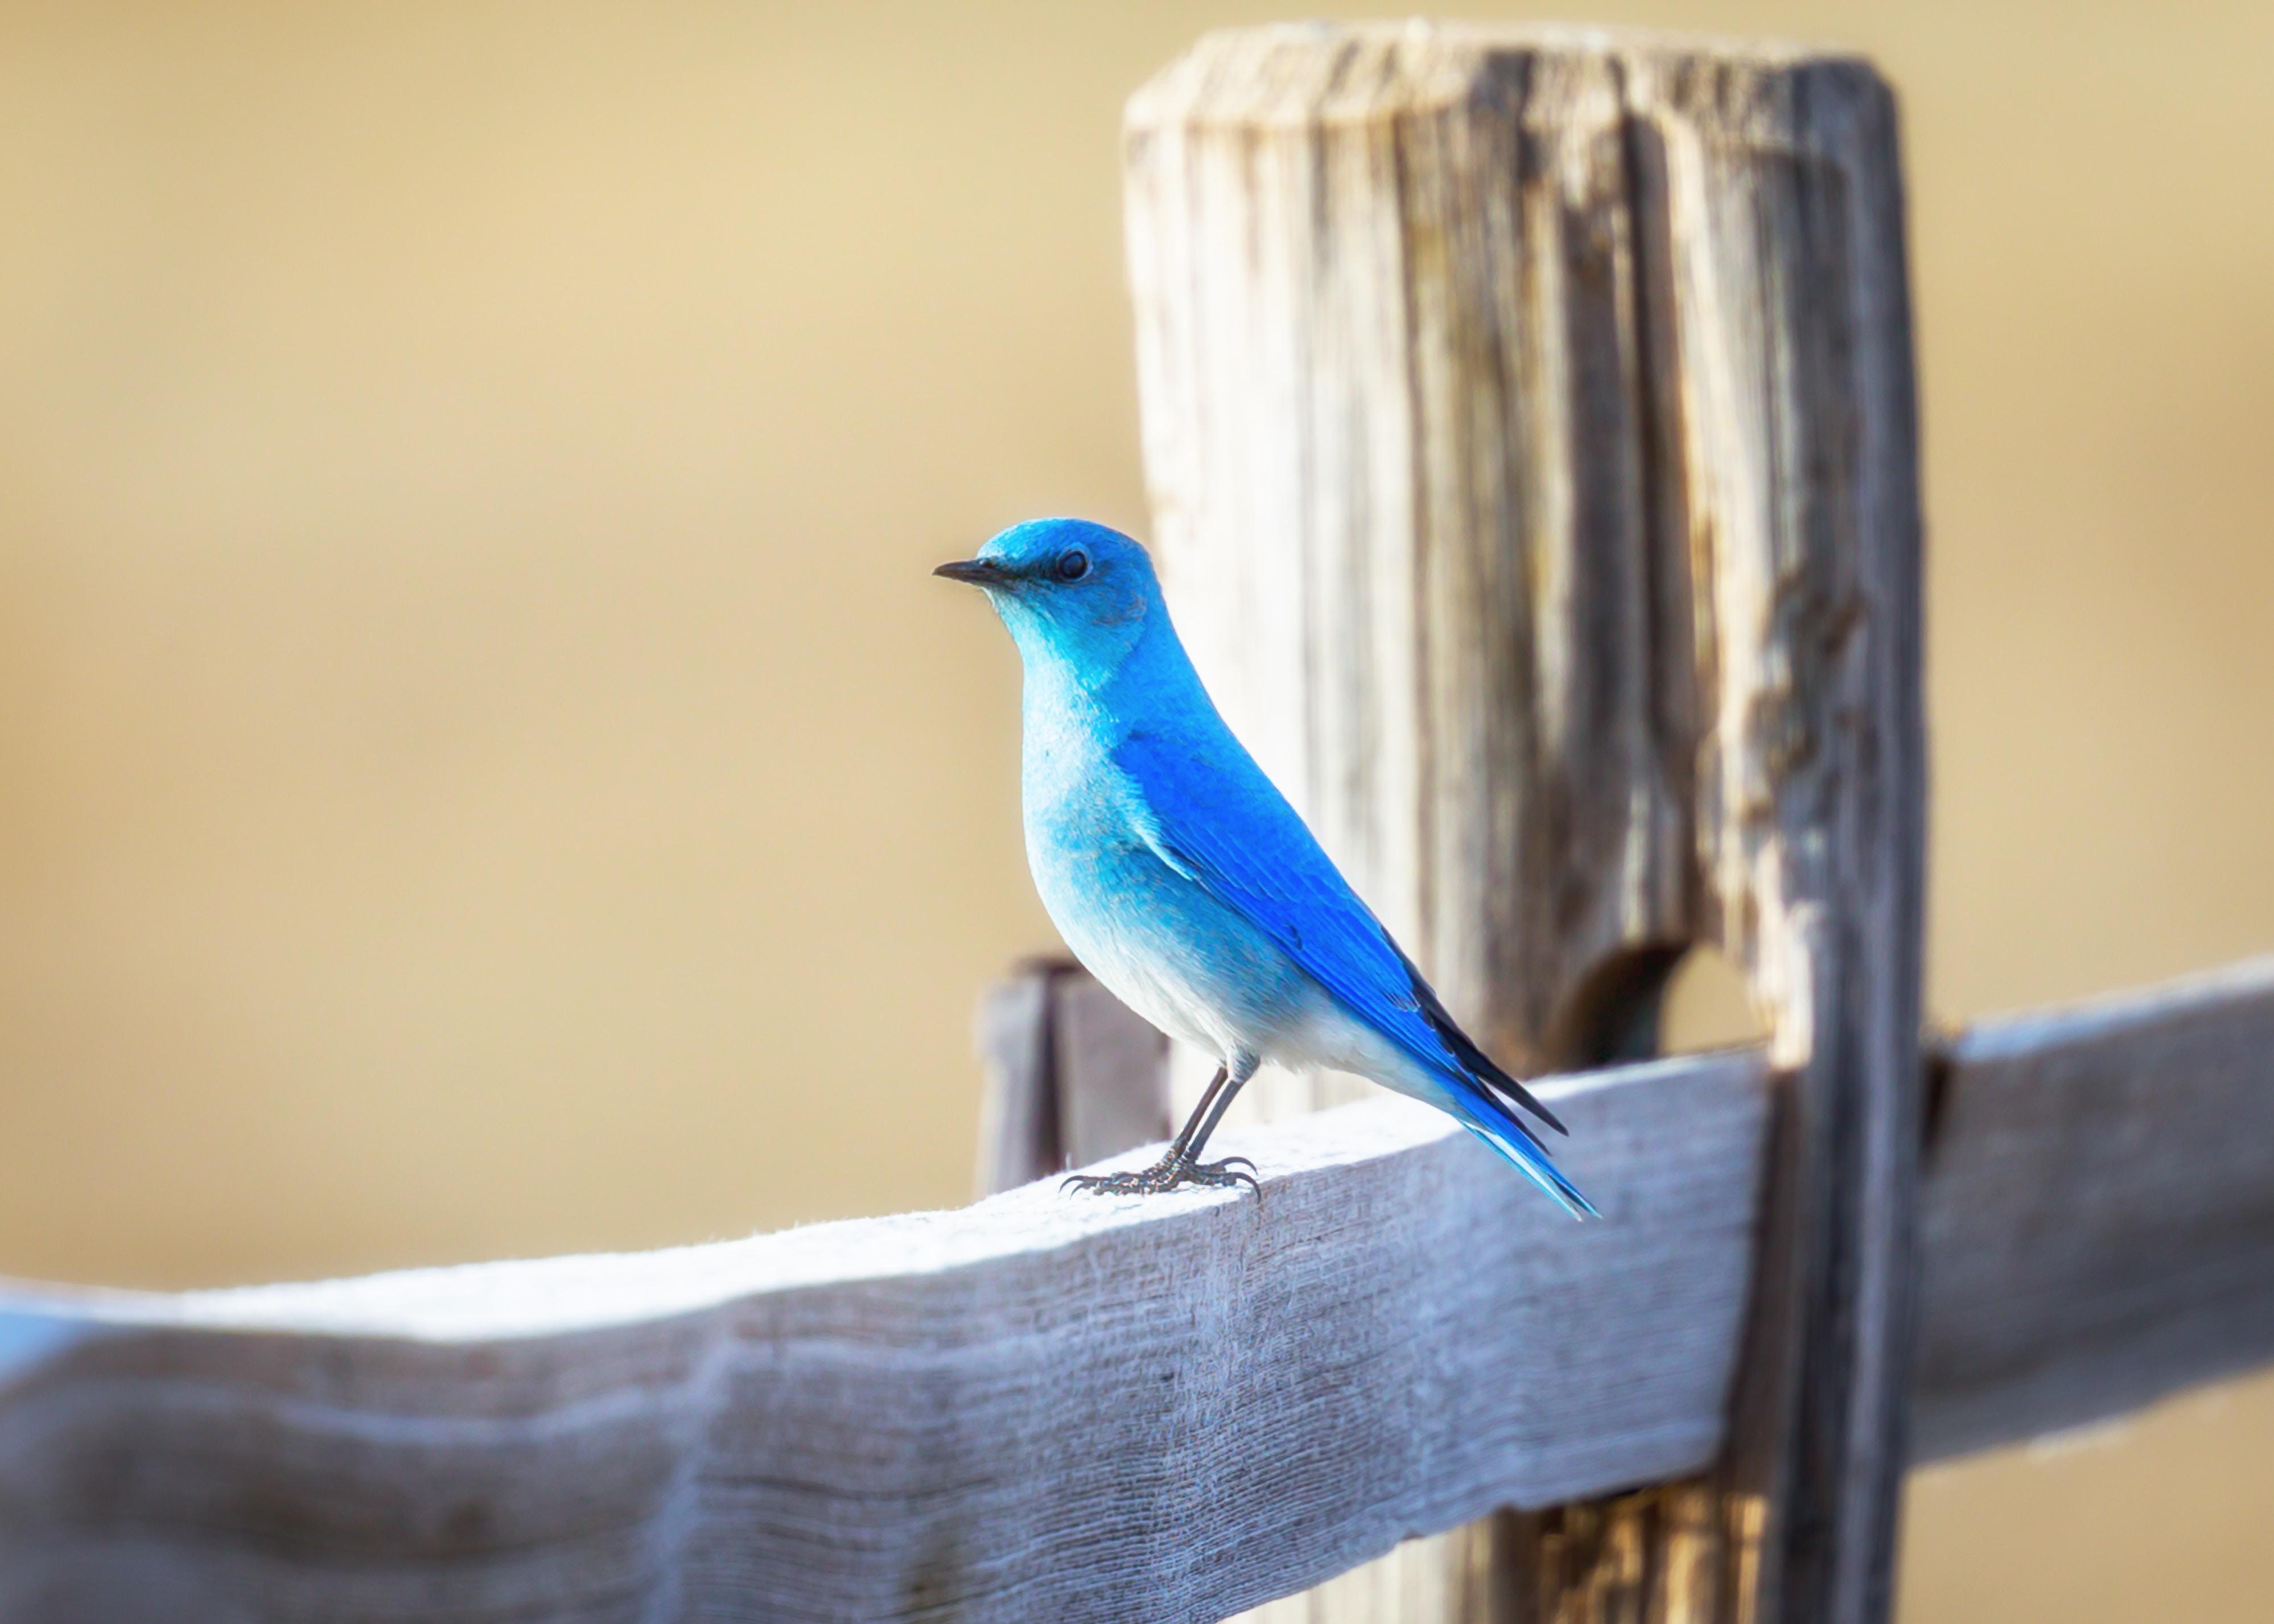 blue bird on wooden fence